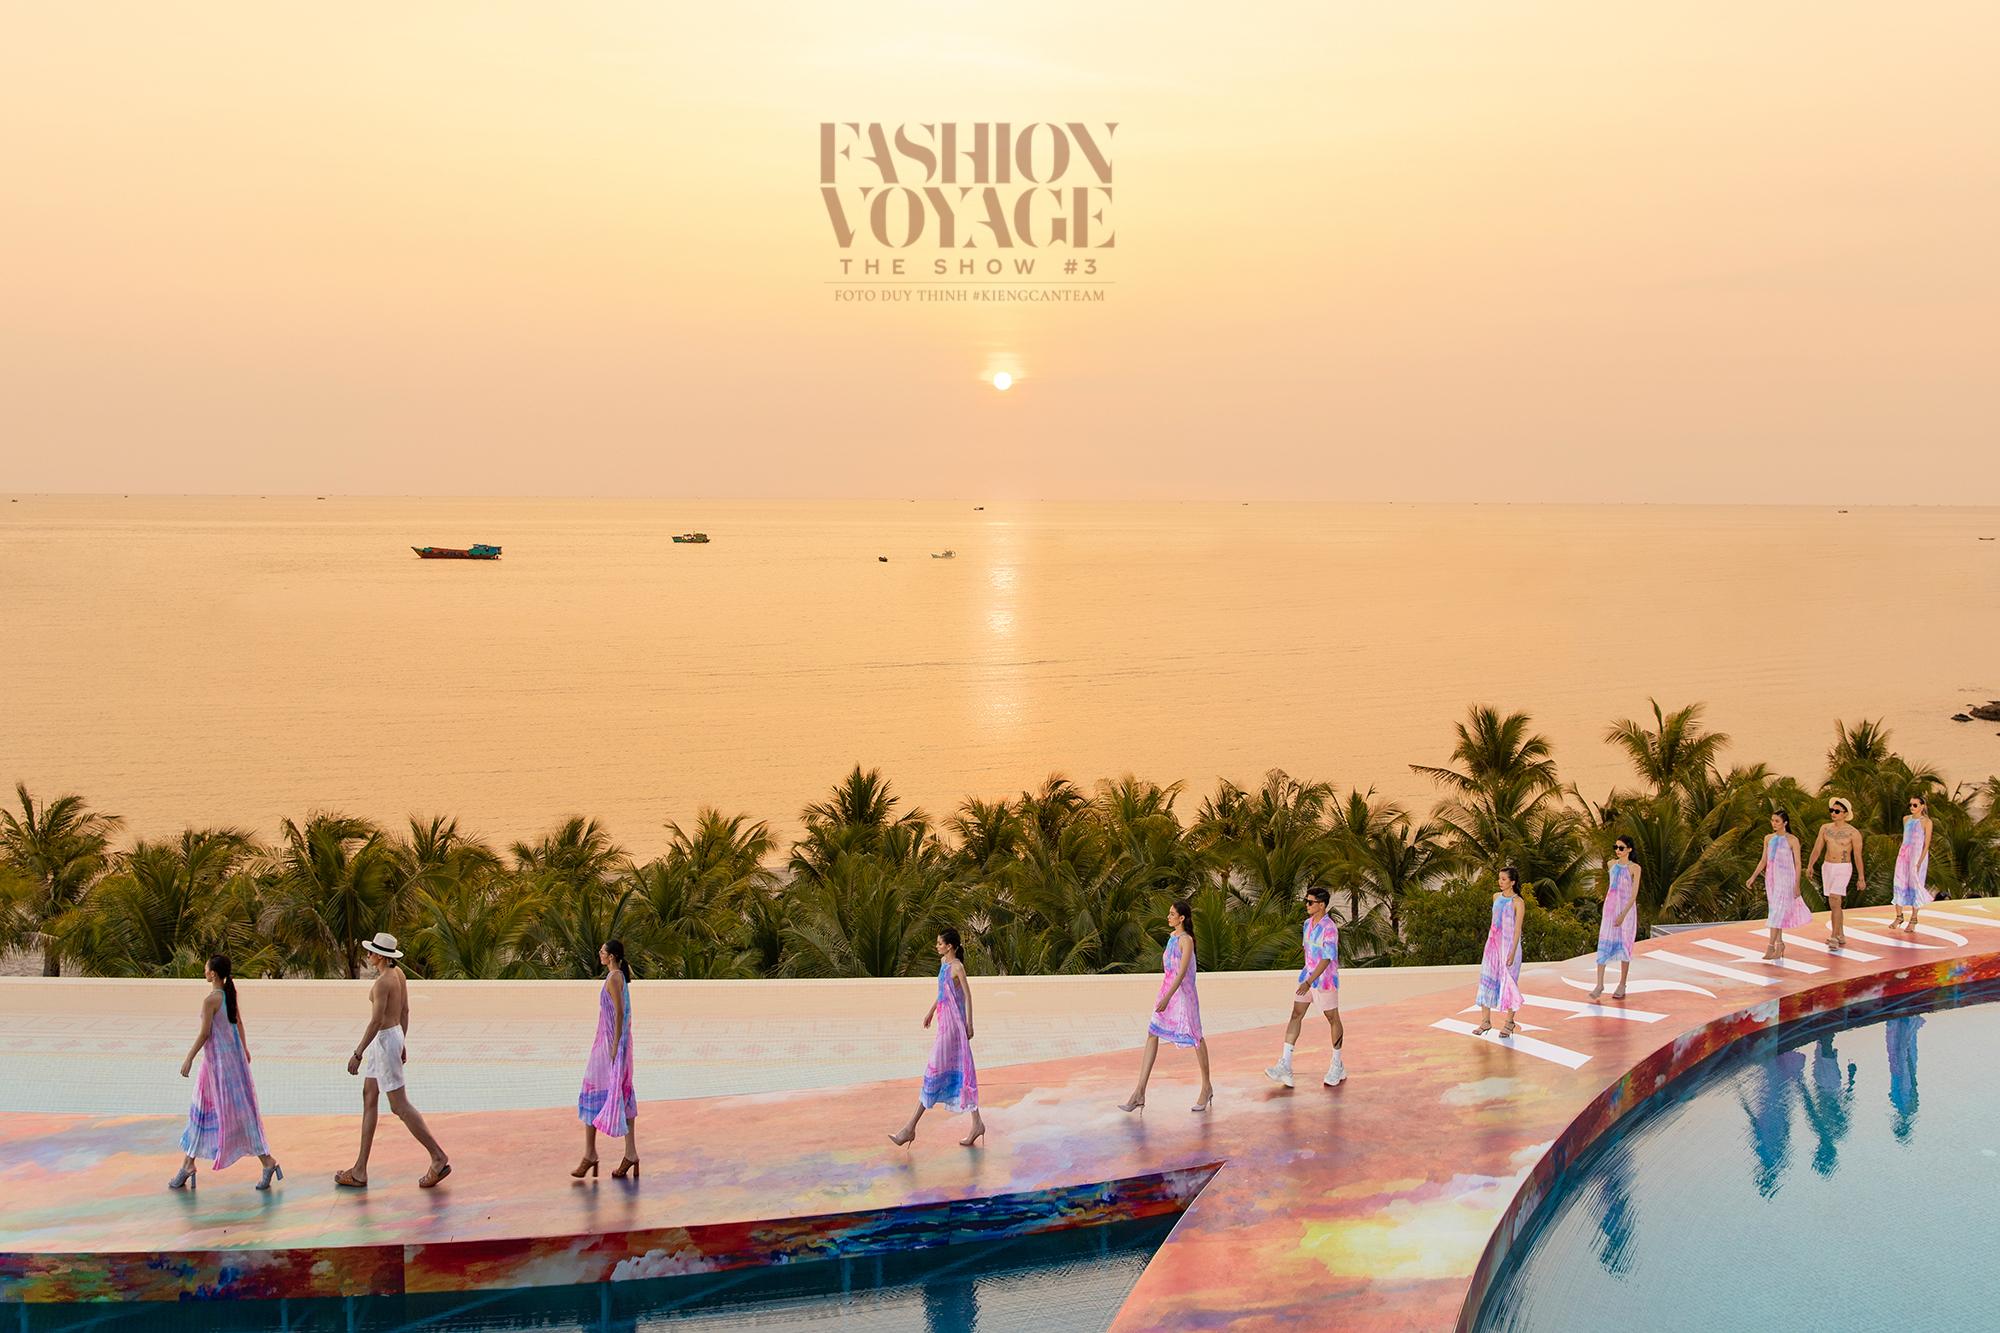 fashion voyage the show 3